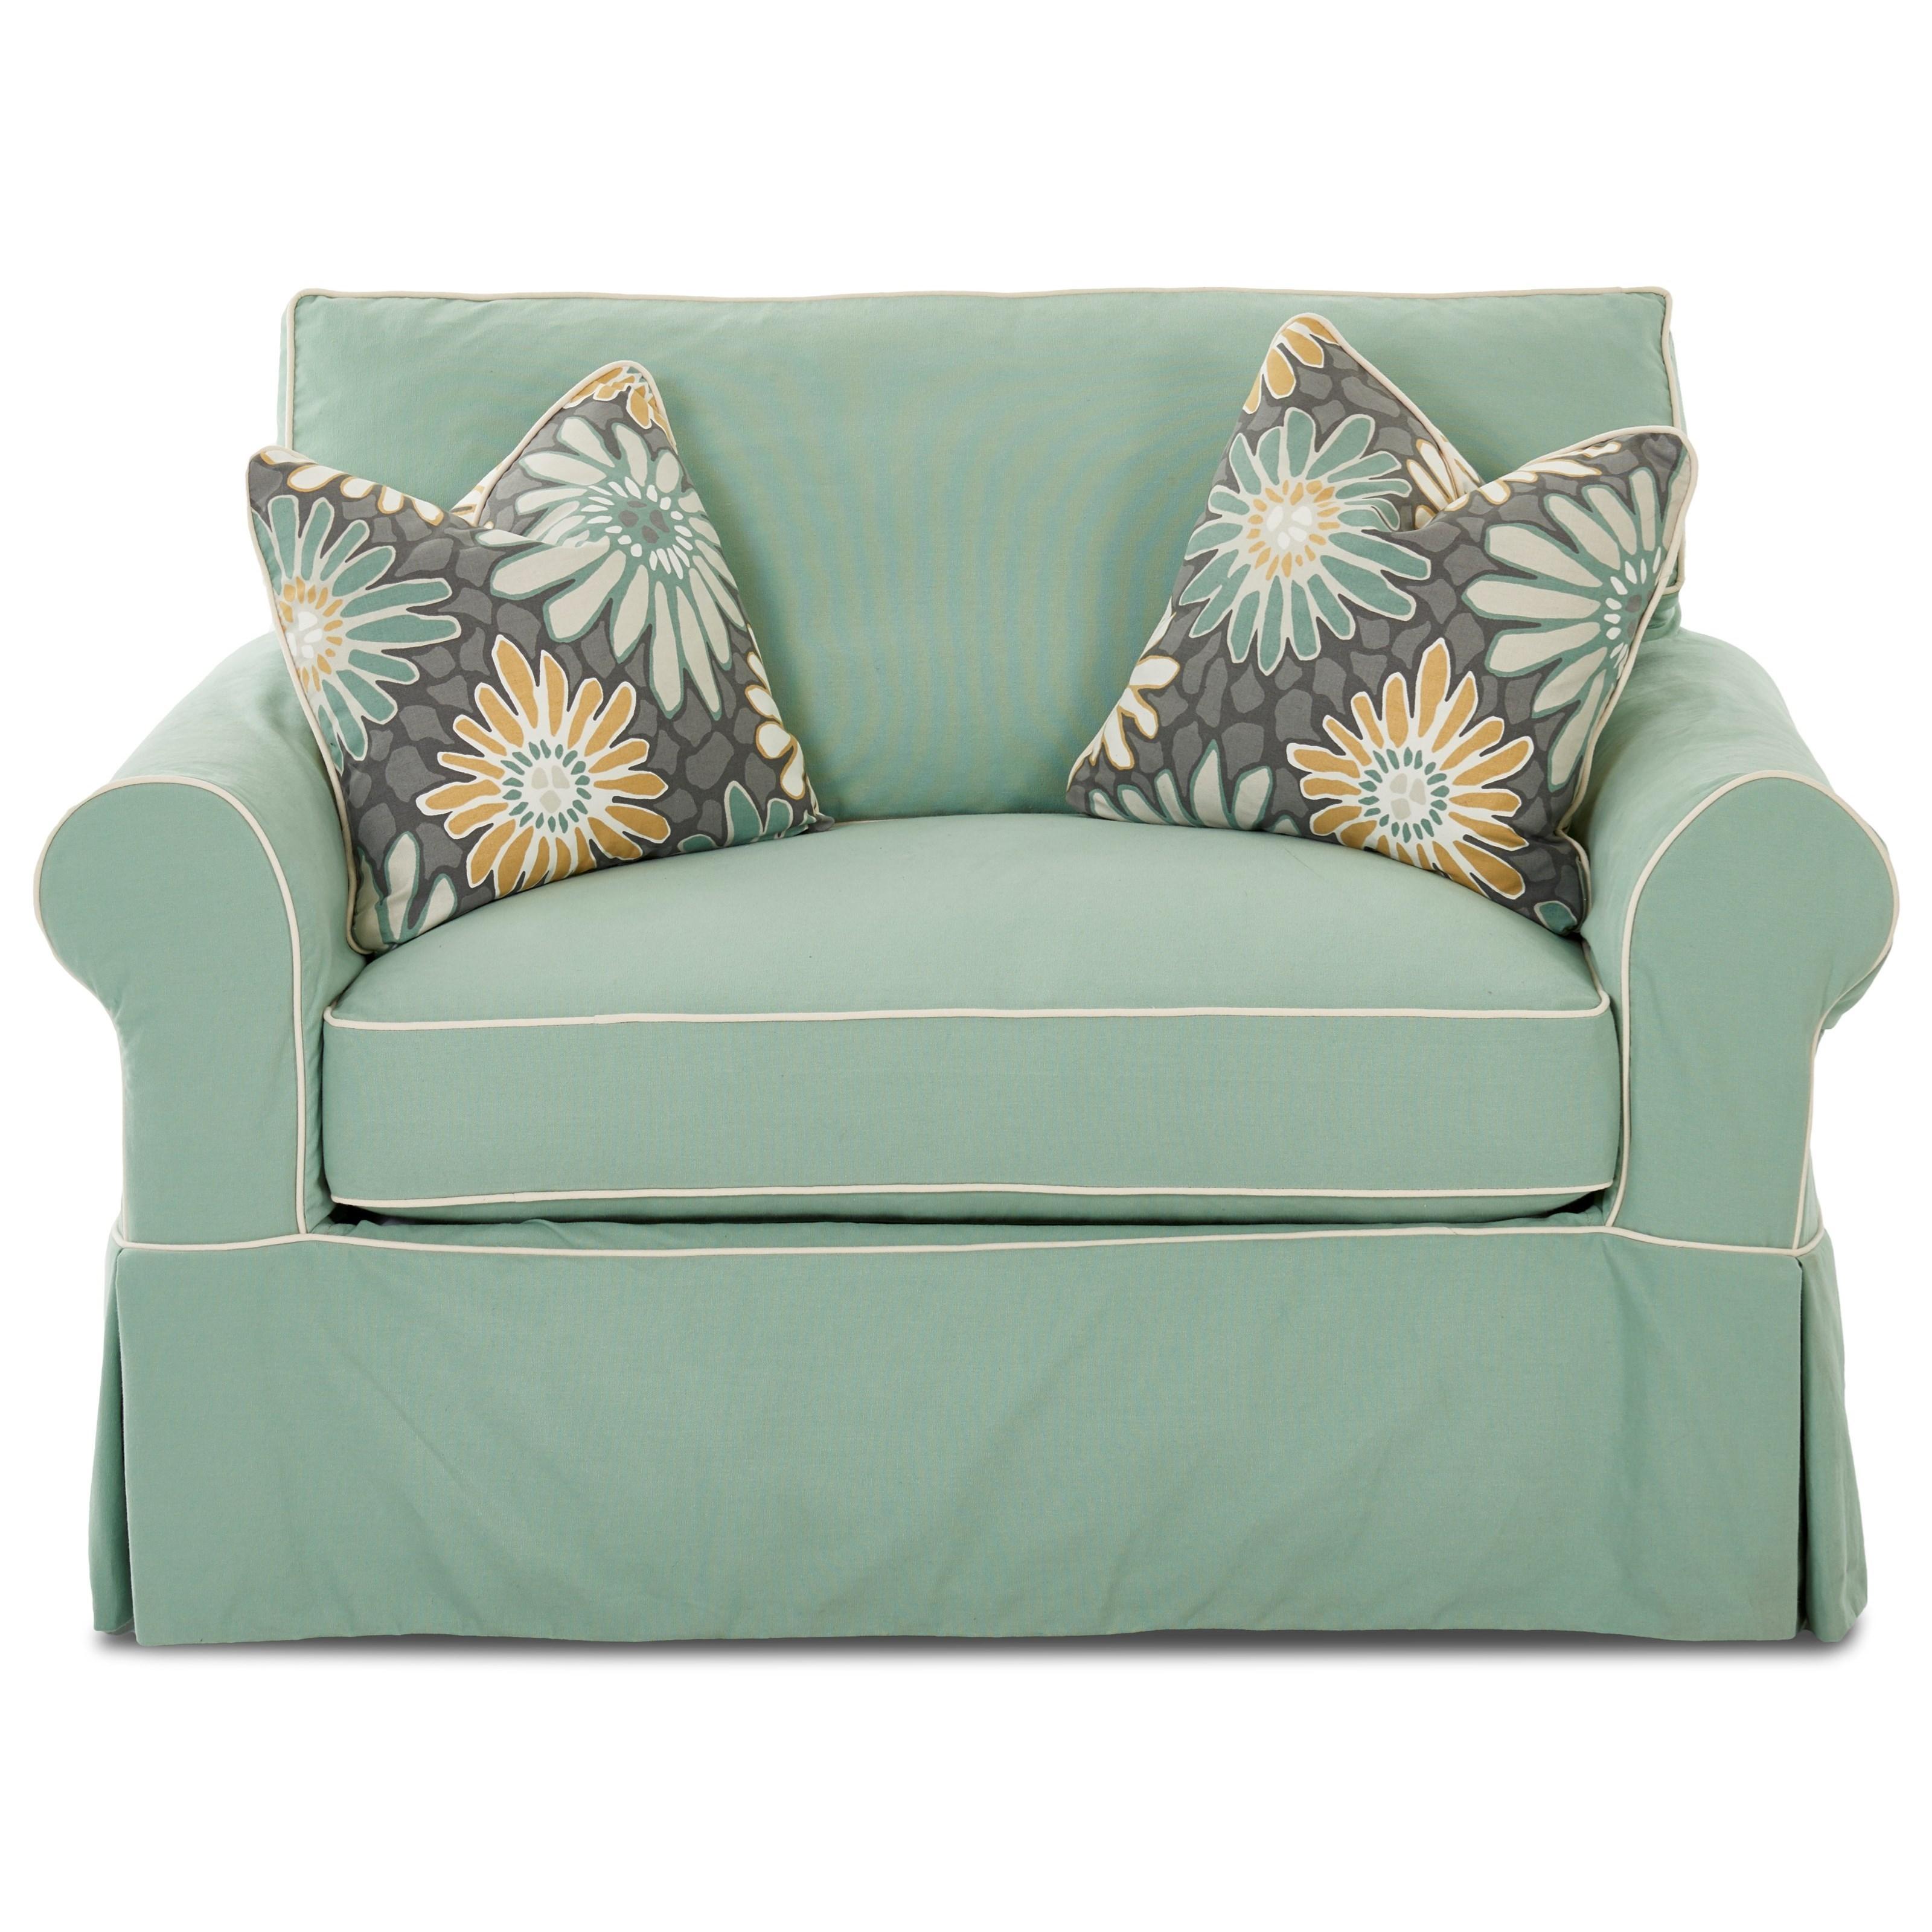 twin sleeper sofa slipcover u shaped modular sofas uk victoria chair with